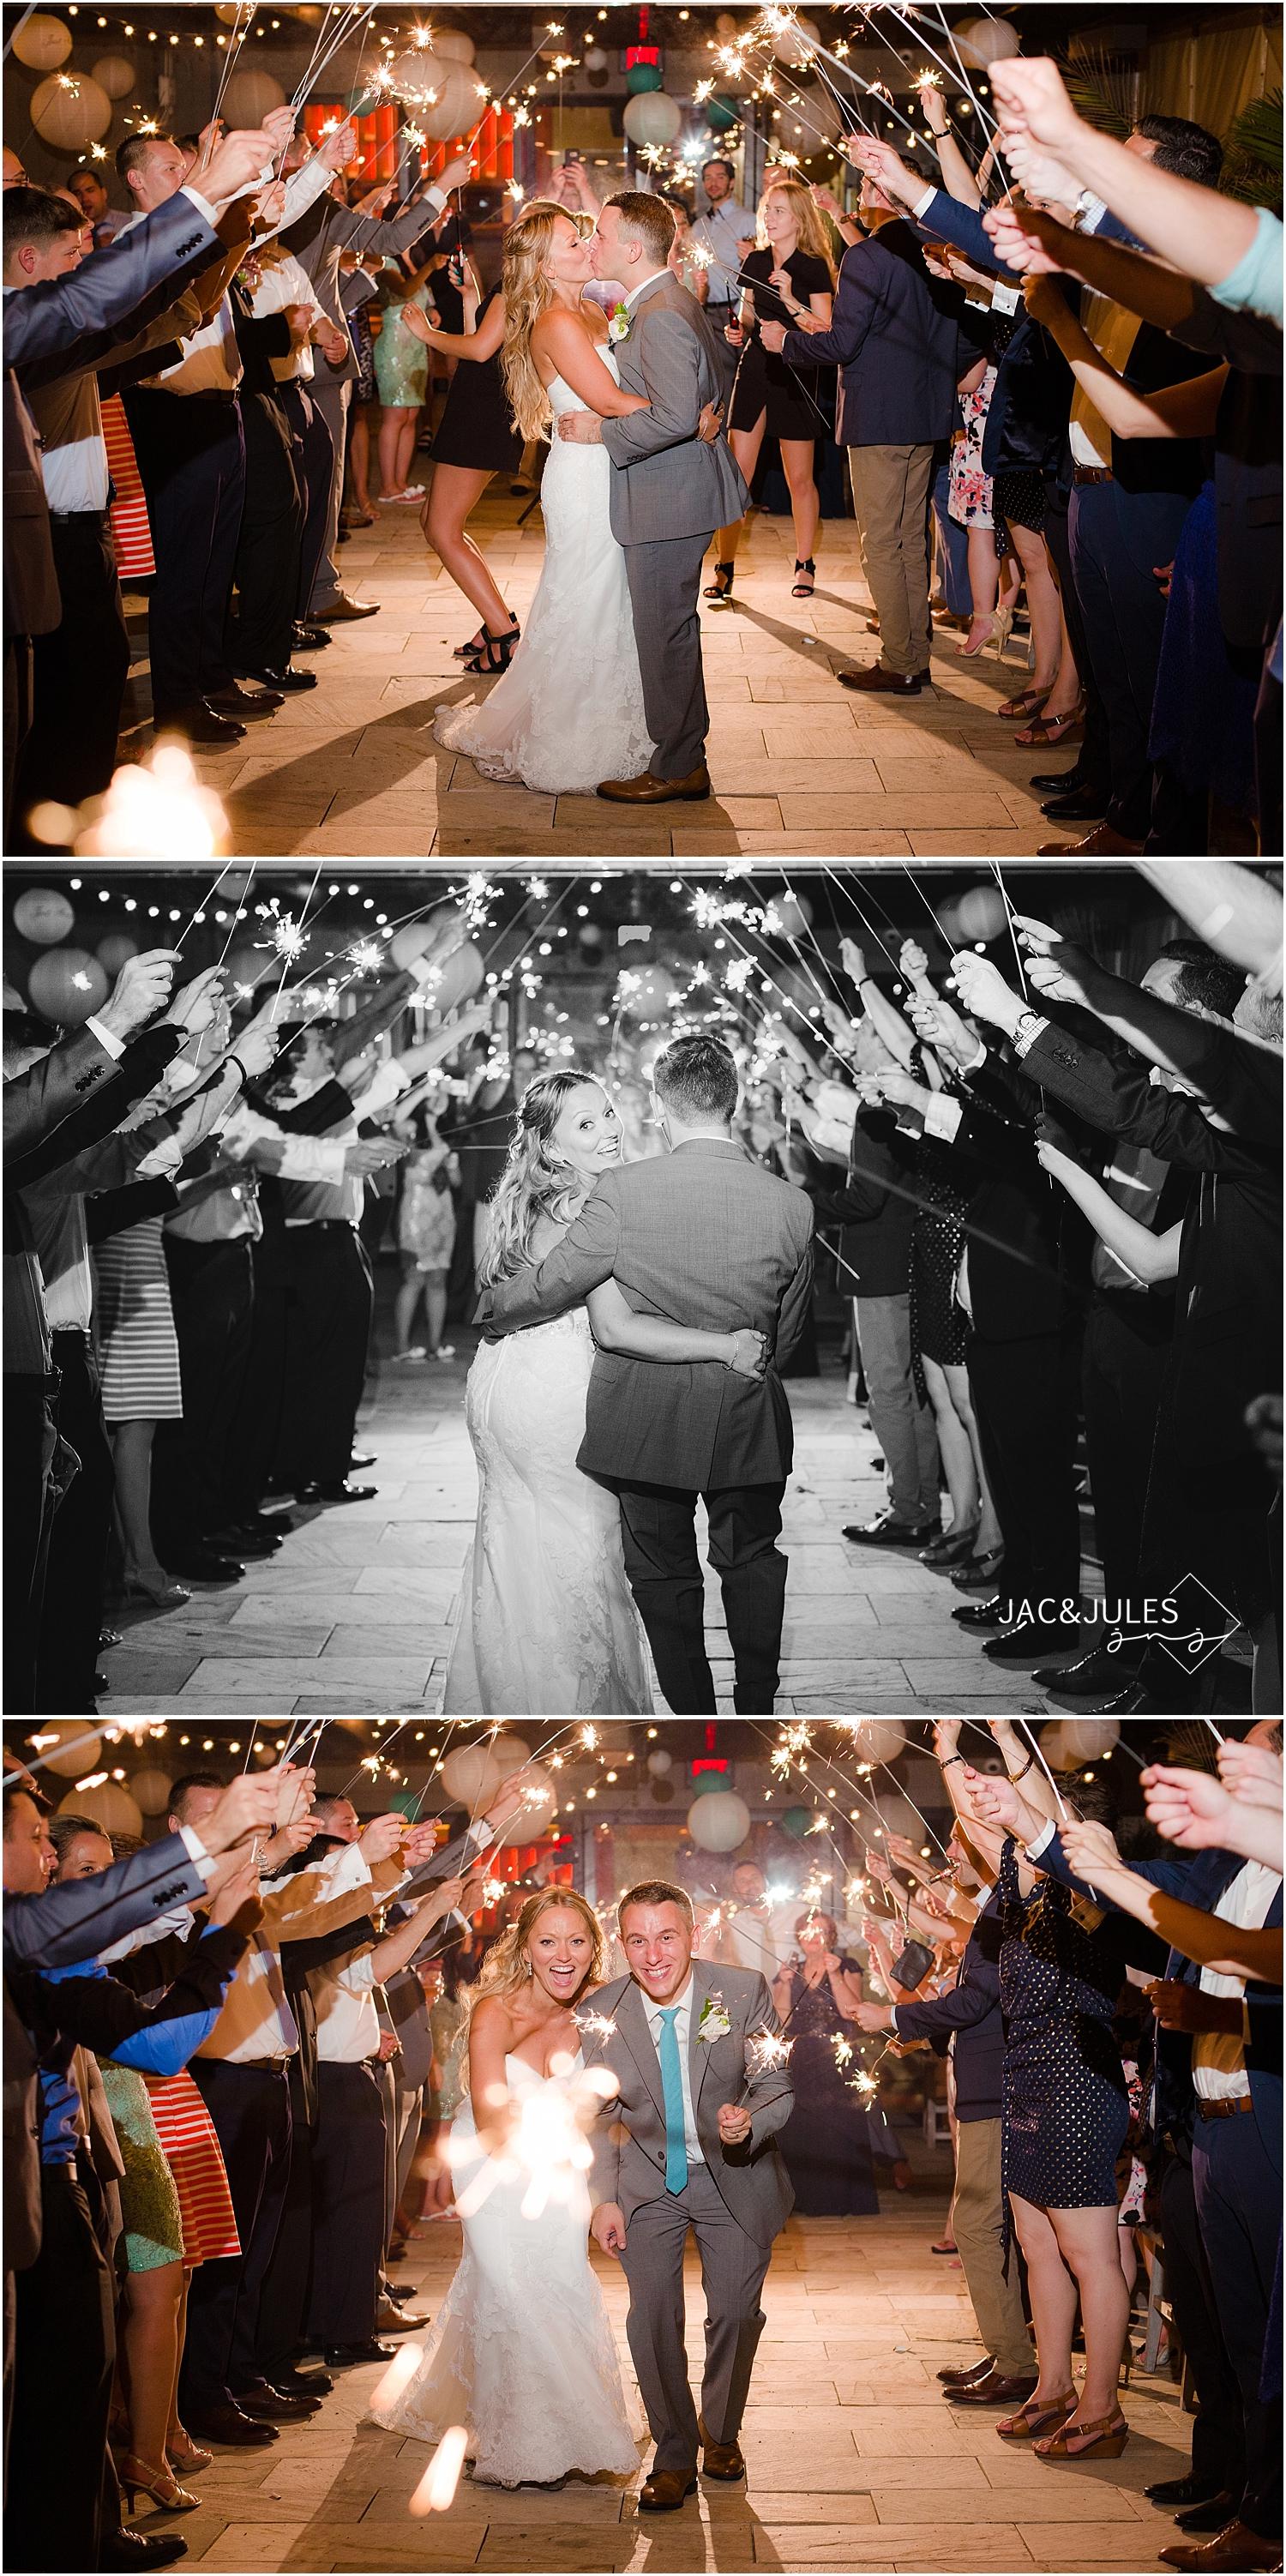 jacnjules photograph a wedding sparkler exit at Le Club Avenue in Long Branch, NJ